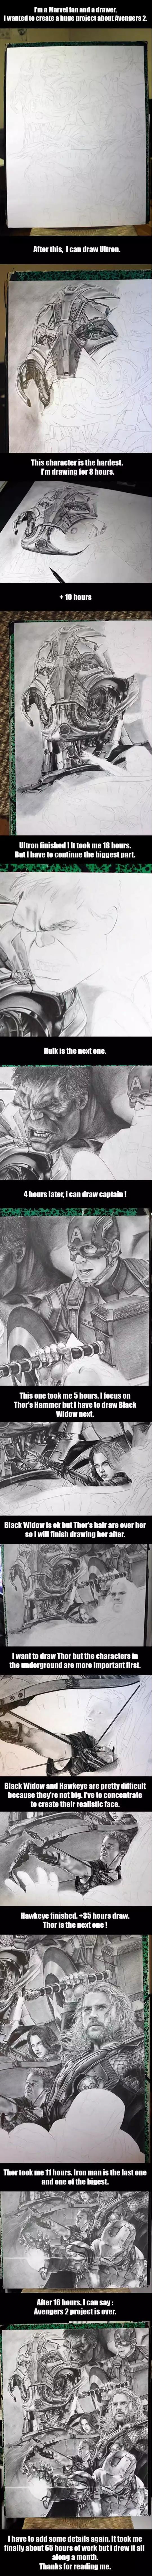 Impressive Avengers Illustration http://ibeebz.com